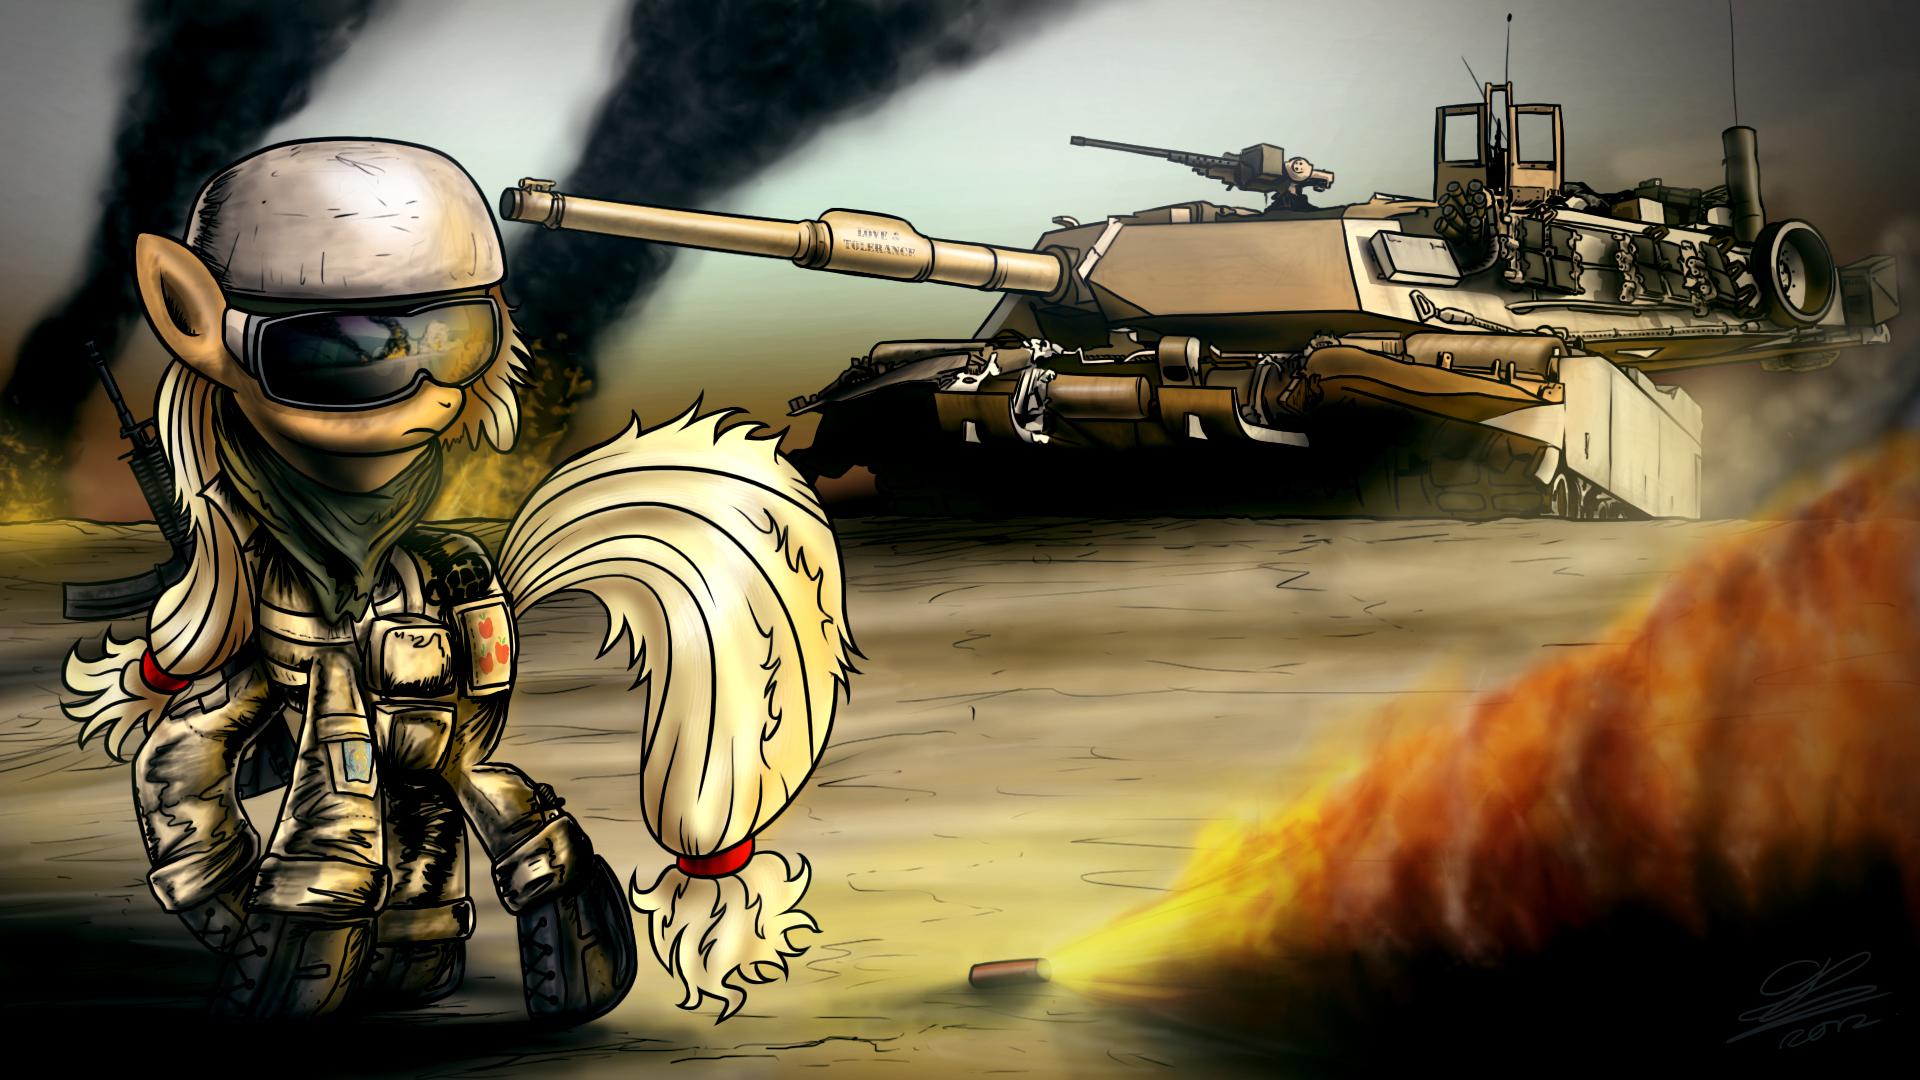 Appletank M1A1 by Dori-to